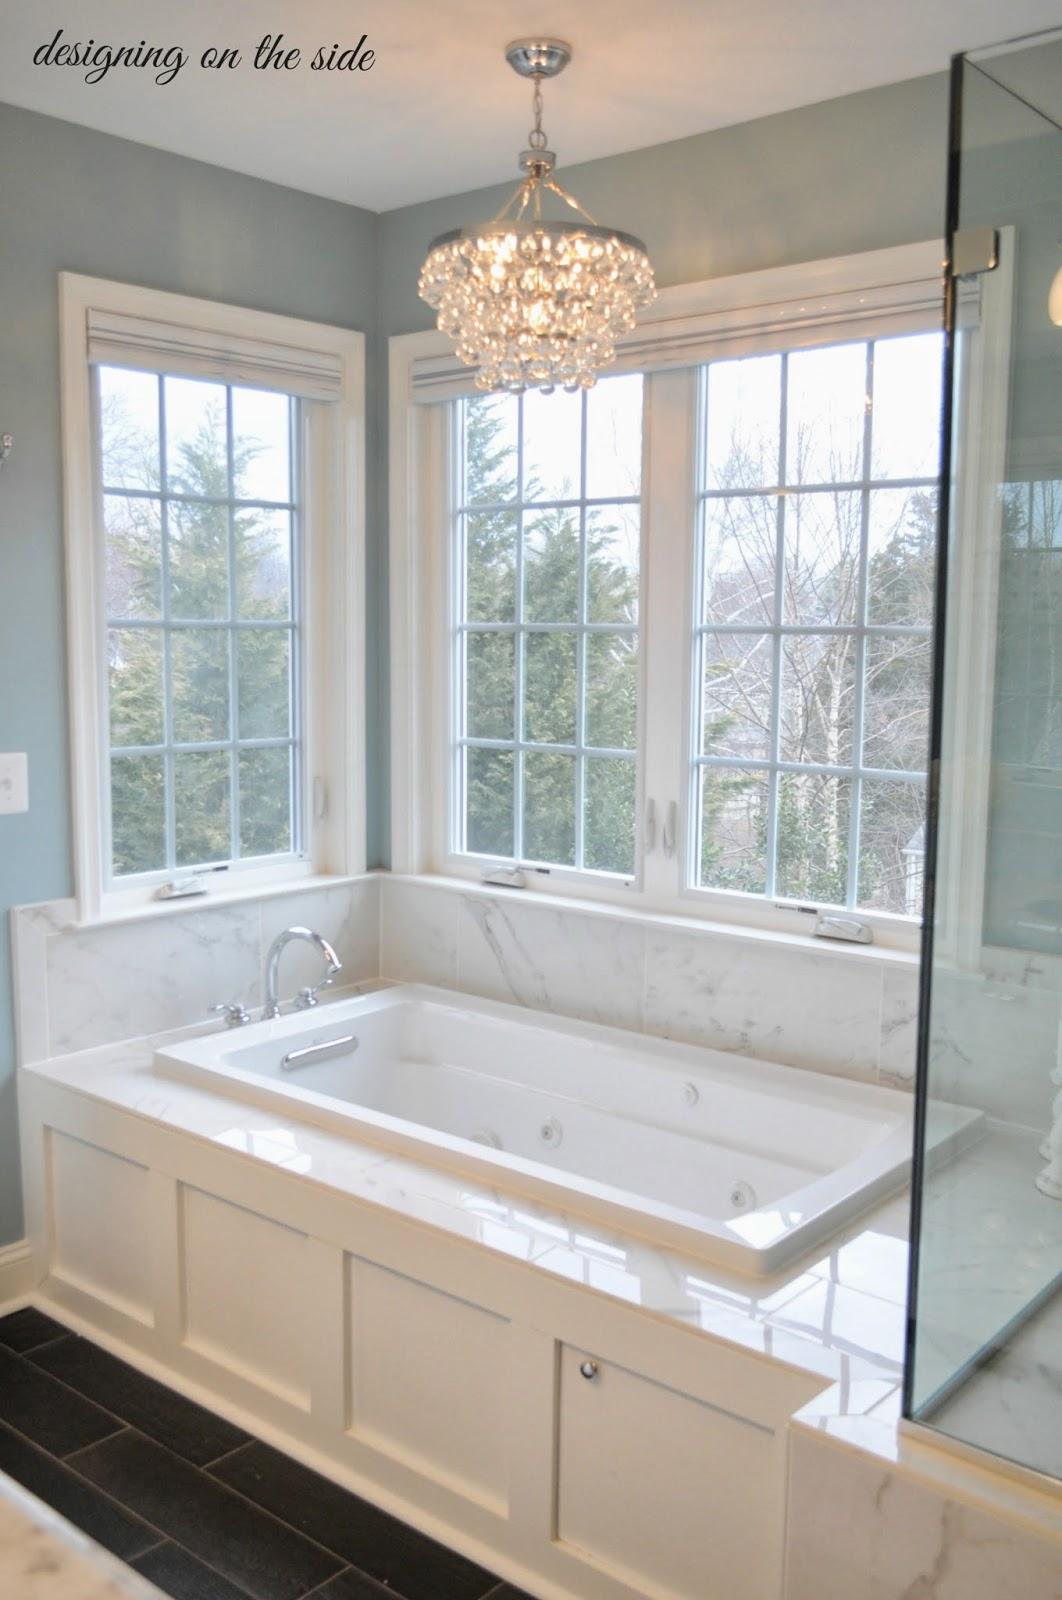 Master Bathroom Reveal: Designing On The Side: Master Bath Reveal